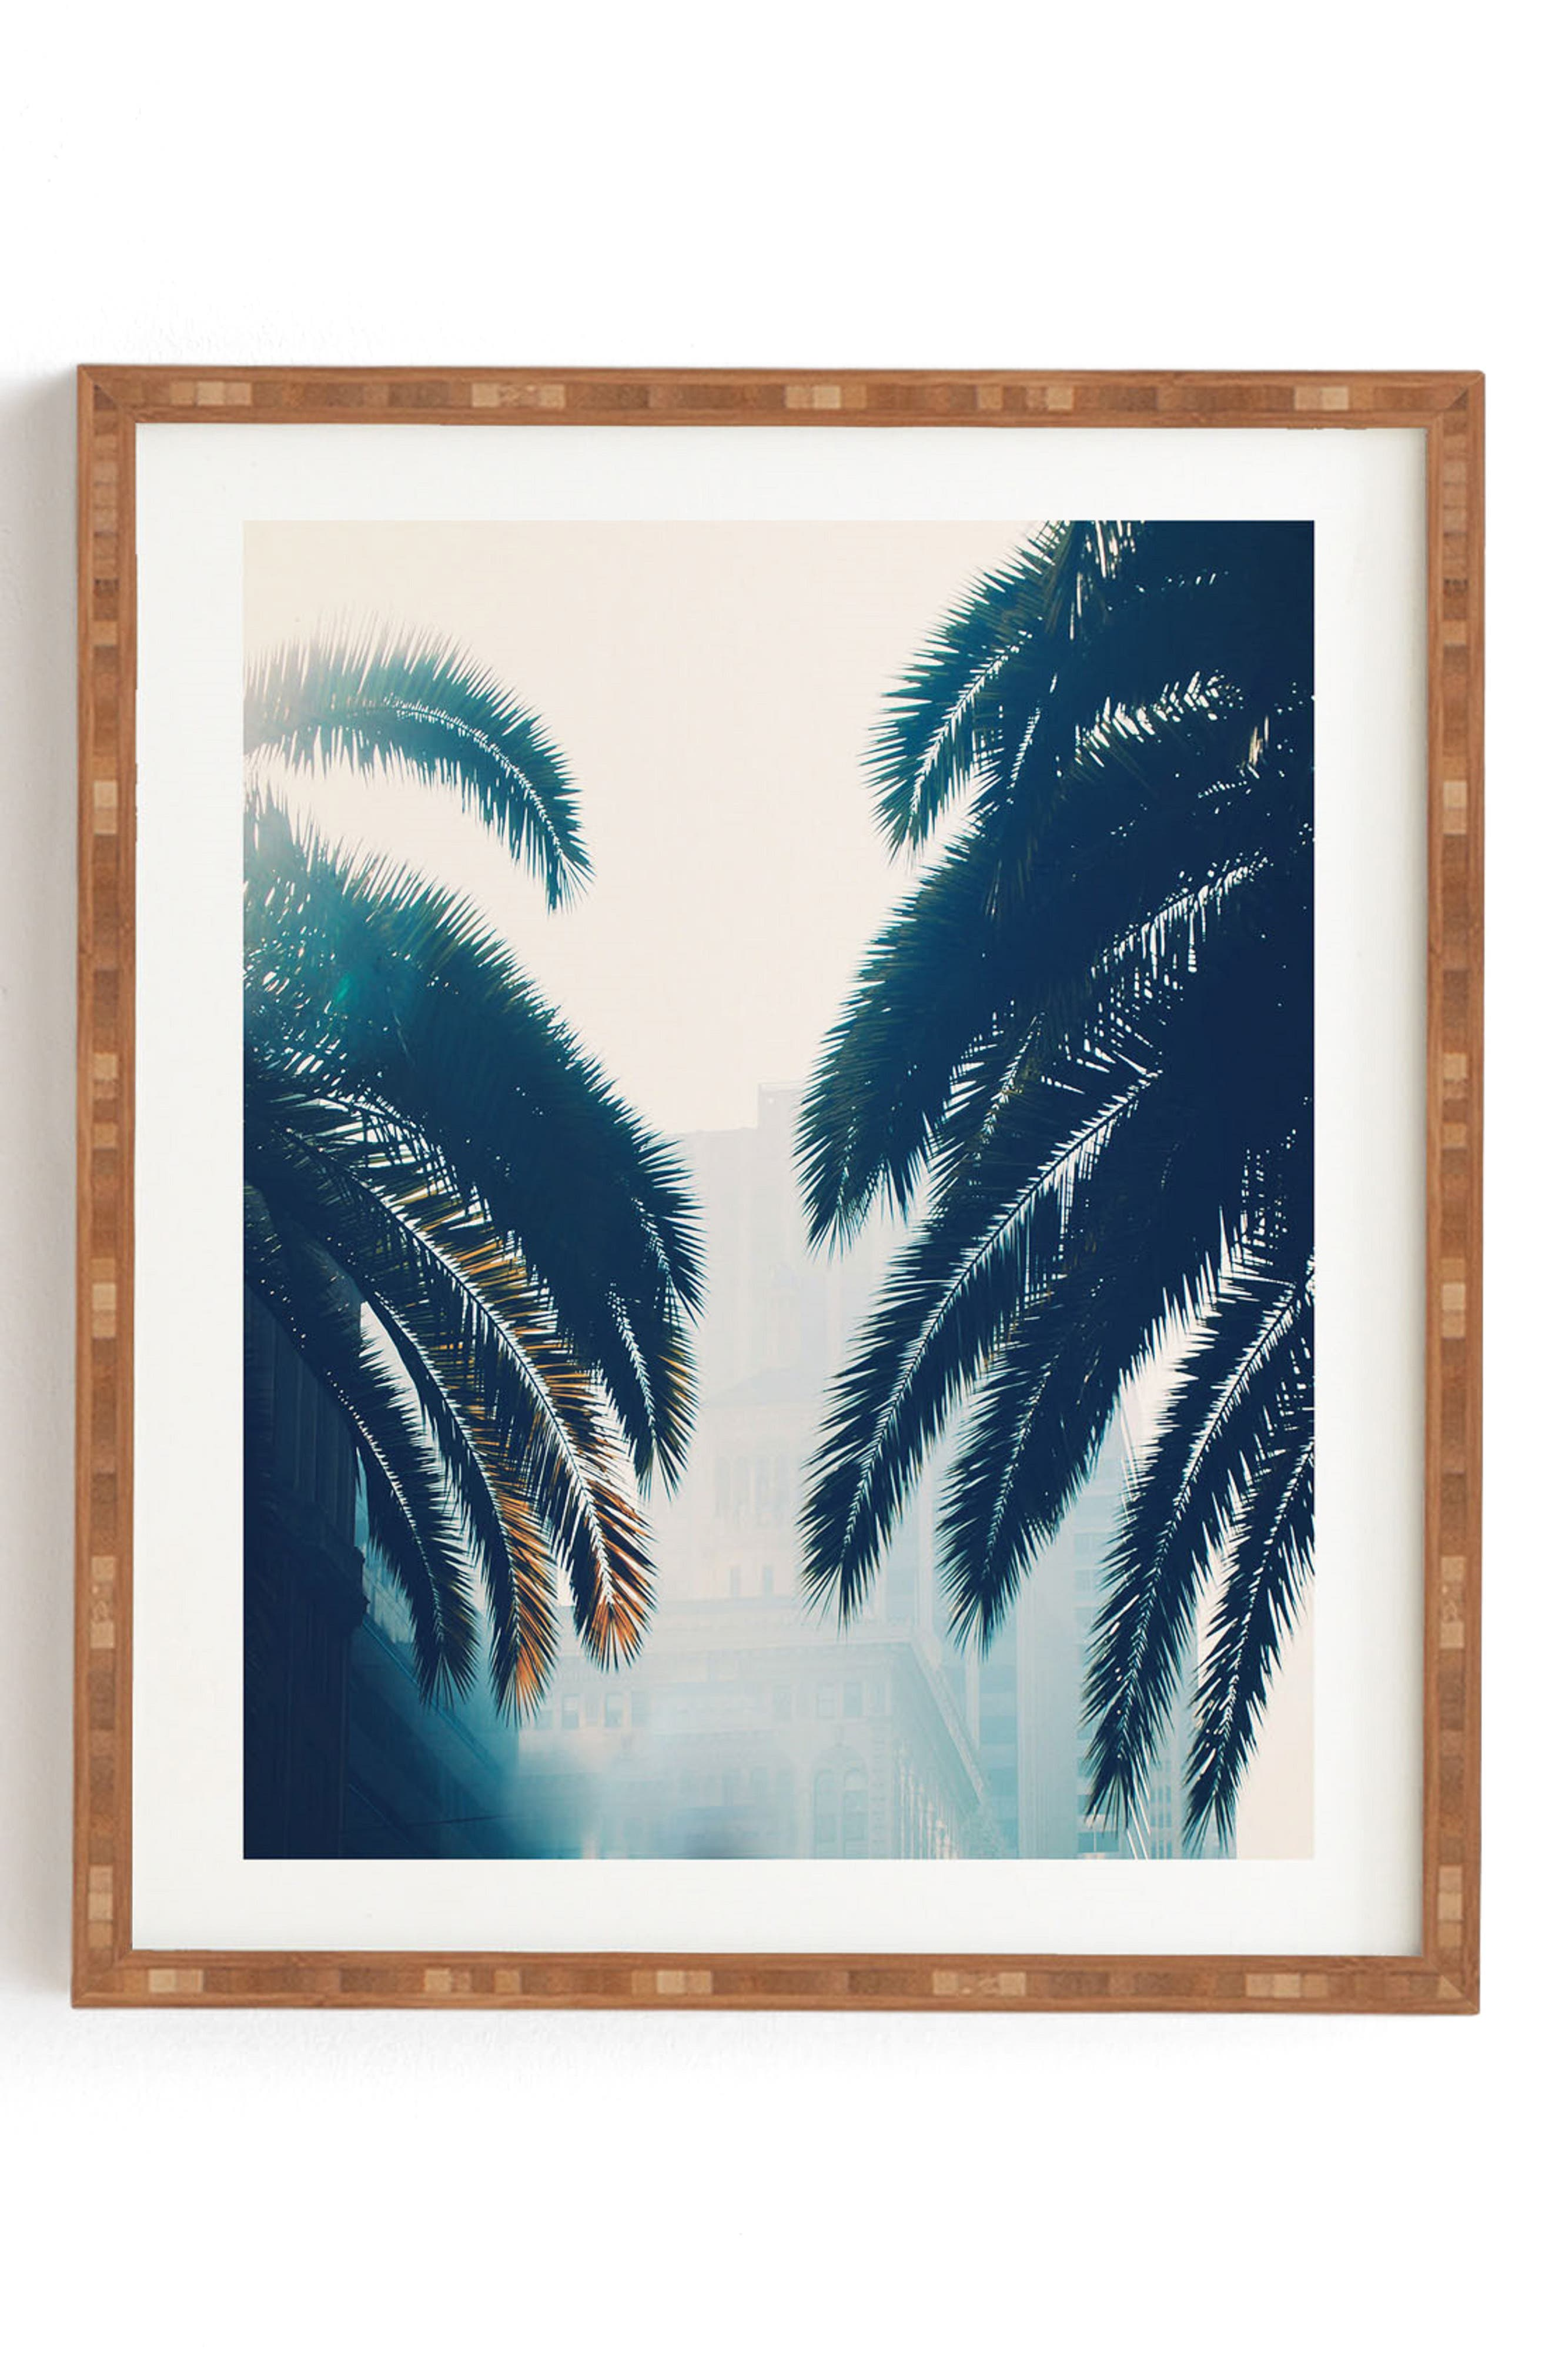 DENY DESIGNS, Chelsea Victoria - California Blue Framed Wall Art, Main thumbnail 1, color, BLUE